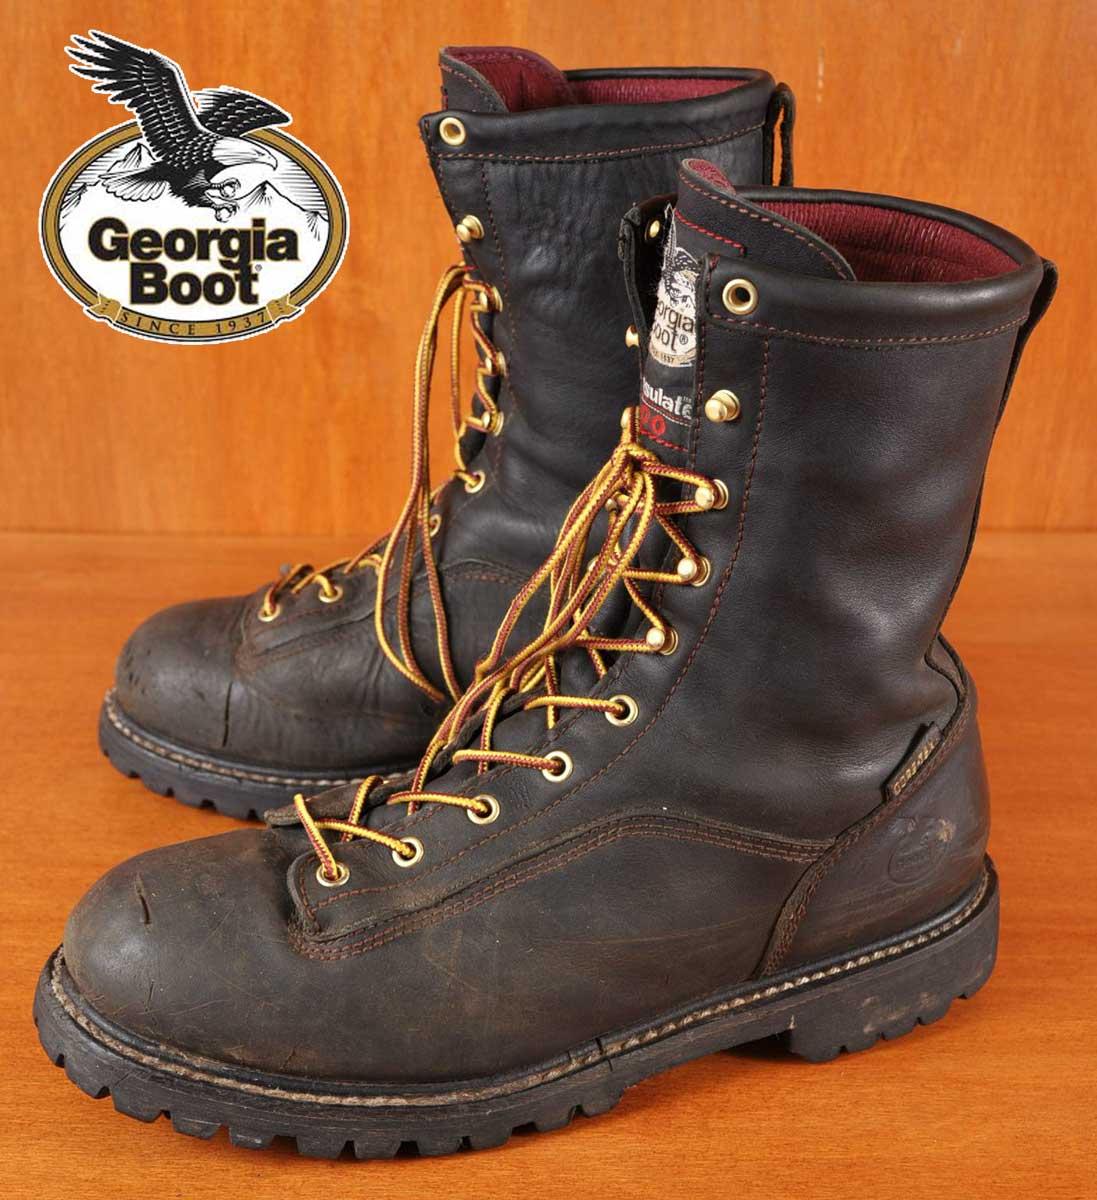 91d6d644c8d Georgia Boot Georgia boots and GORE-TEX Gore-Tex work boots / black leather  / JPN30.0cm: